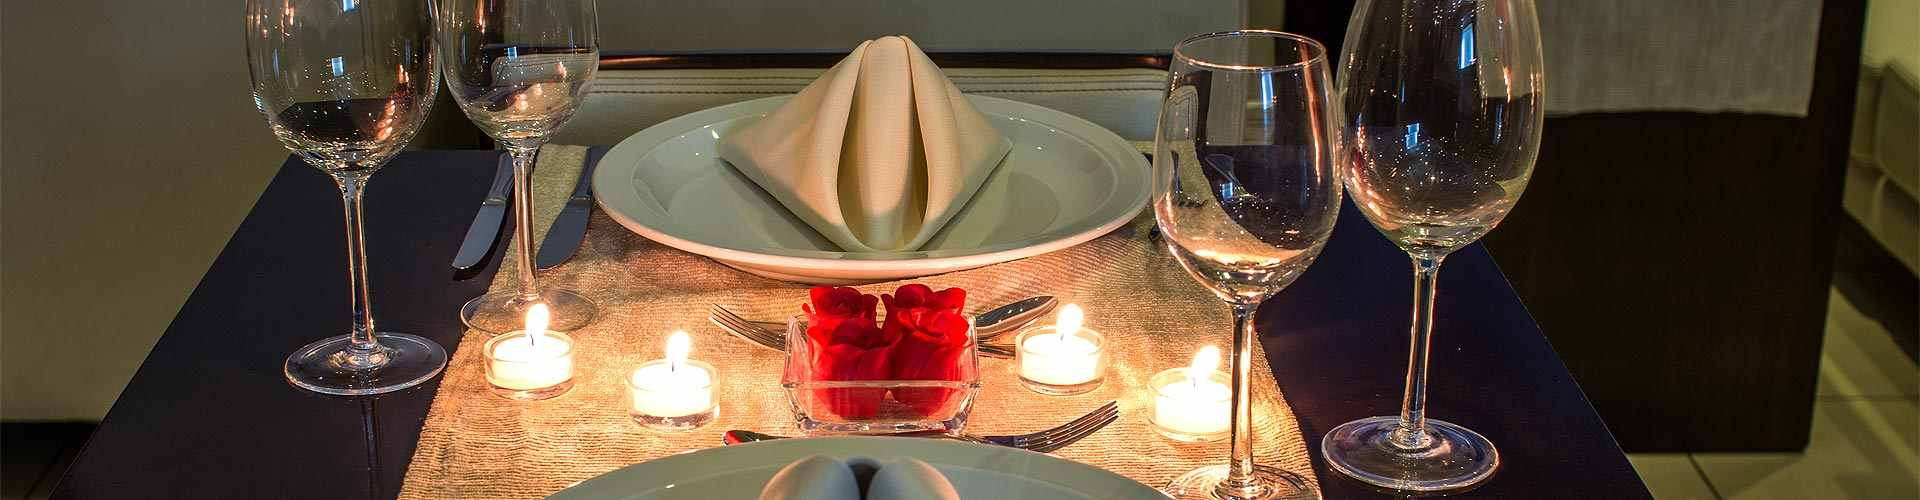 oferta san valentin en restaurantes de Bocairent